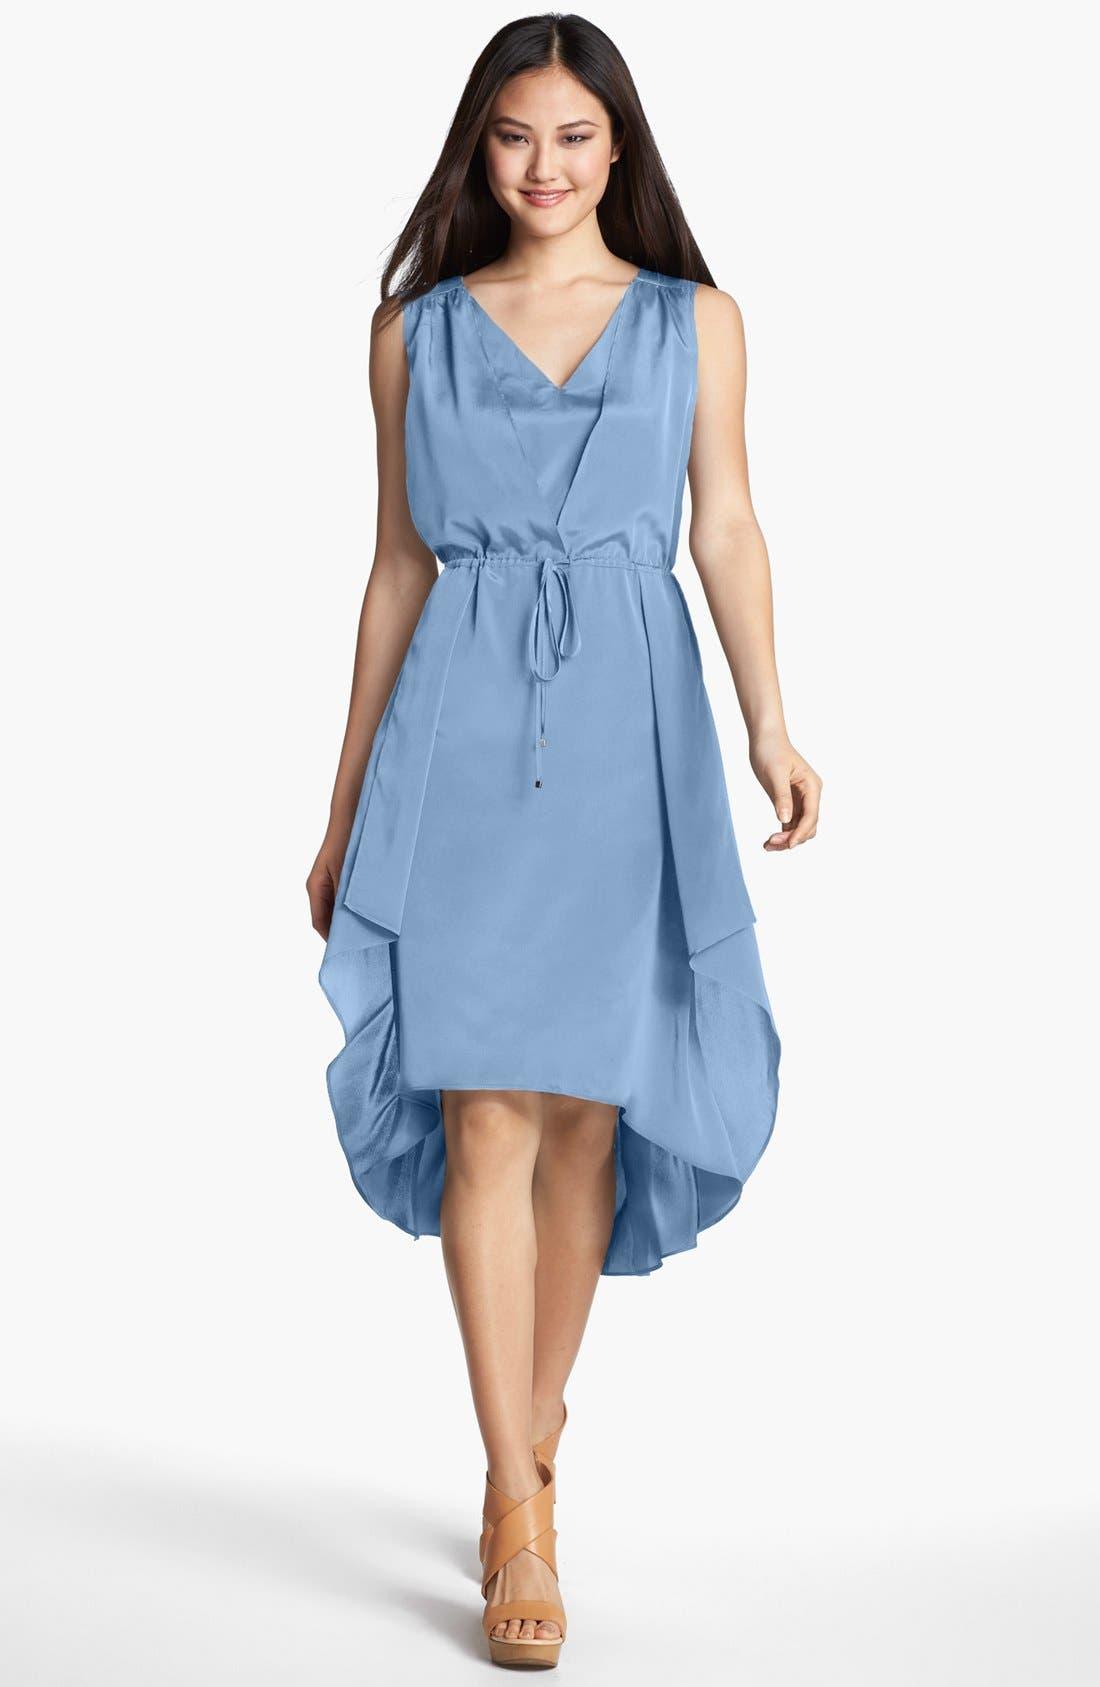 Alternate Image 1 Selected - Kenneth Cole New York 'Gracey' Sleeveless Dress